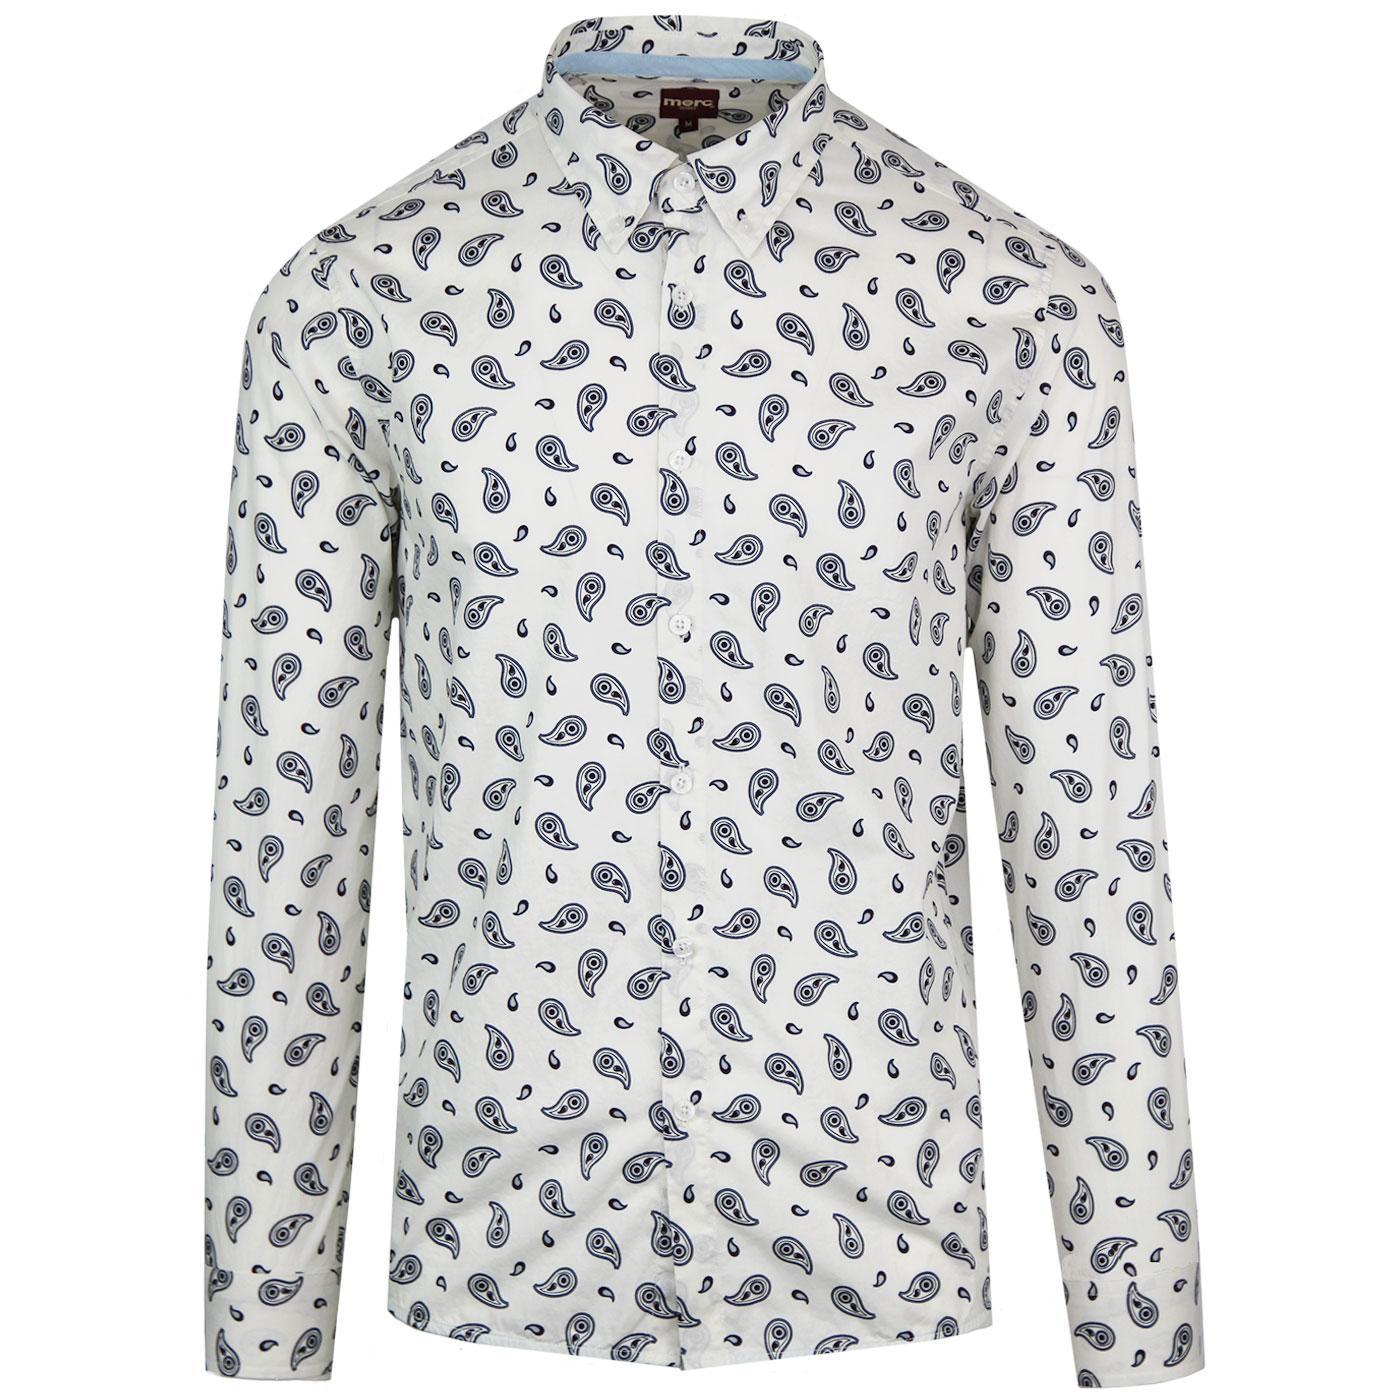 Endell MERC 60s Paisley Print Button Down Shirt W